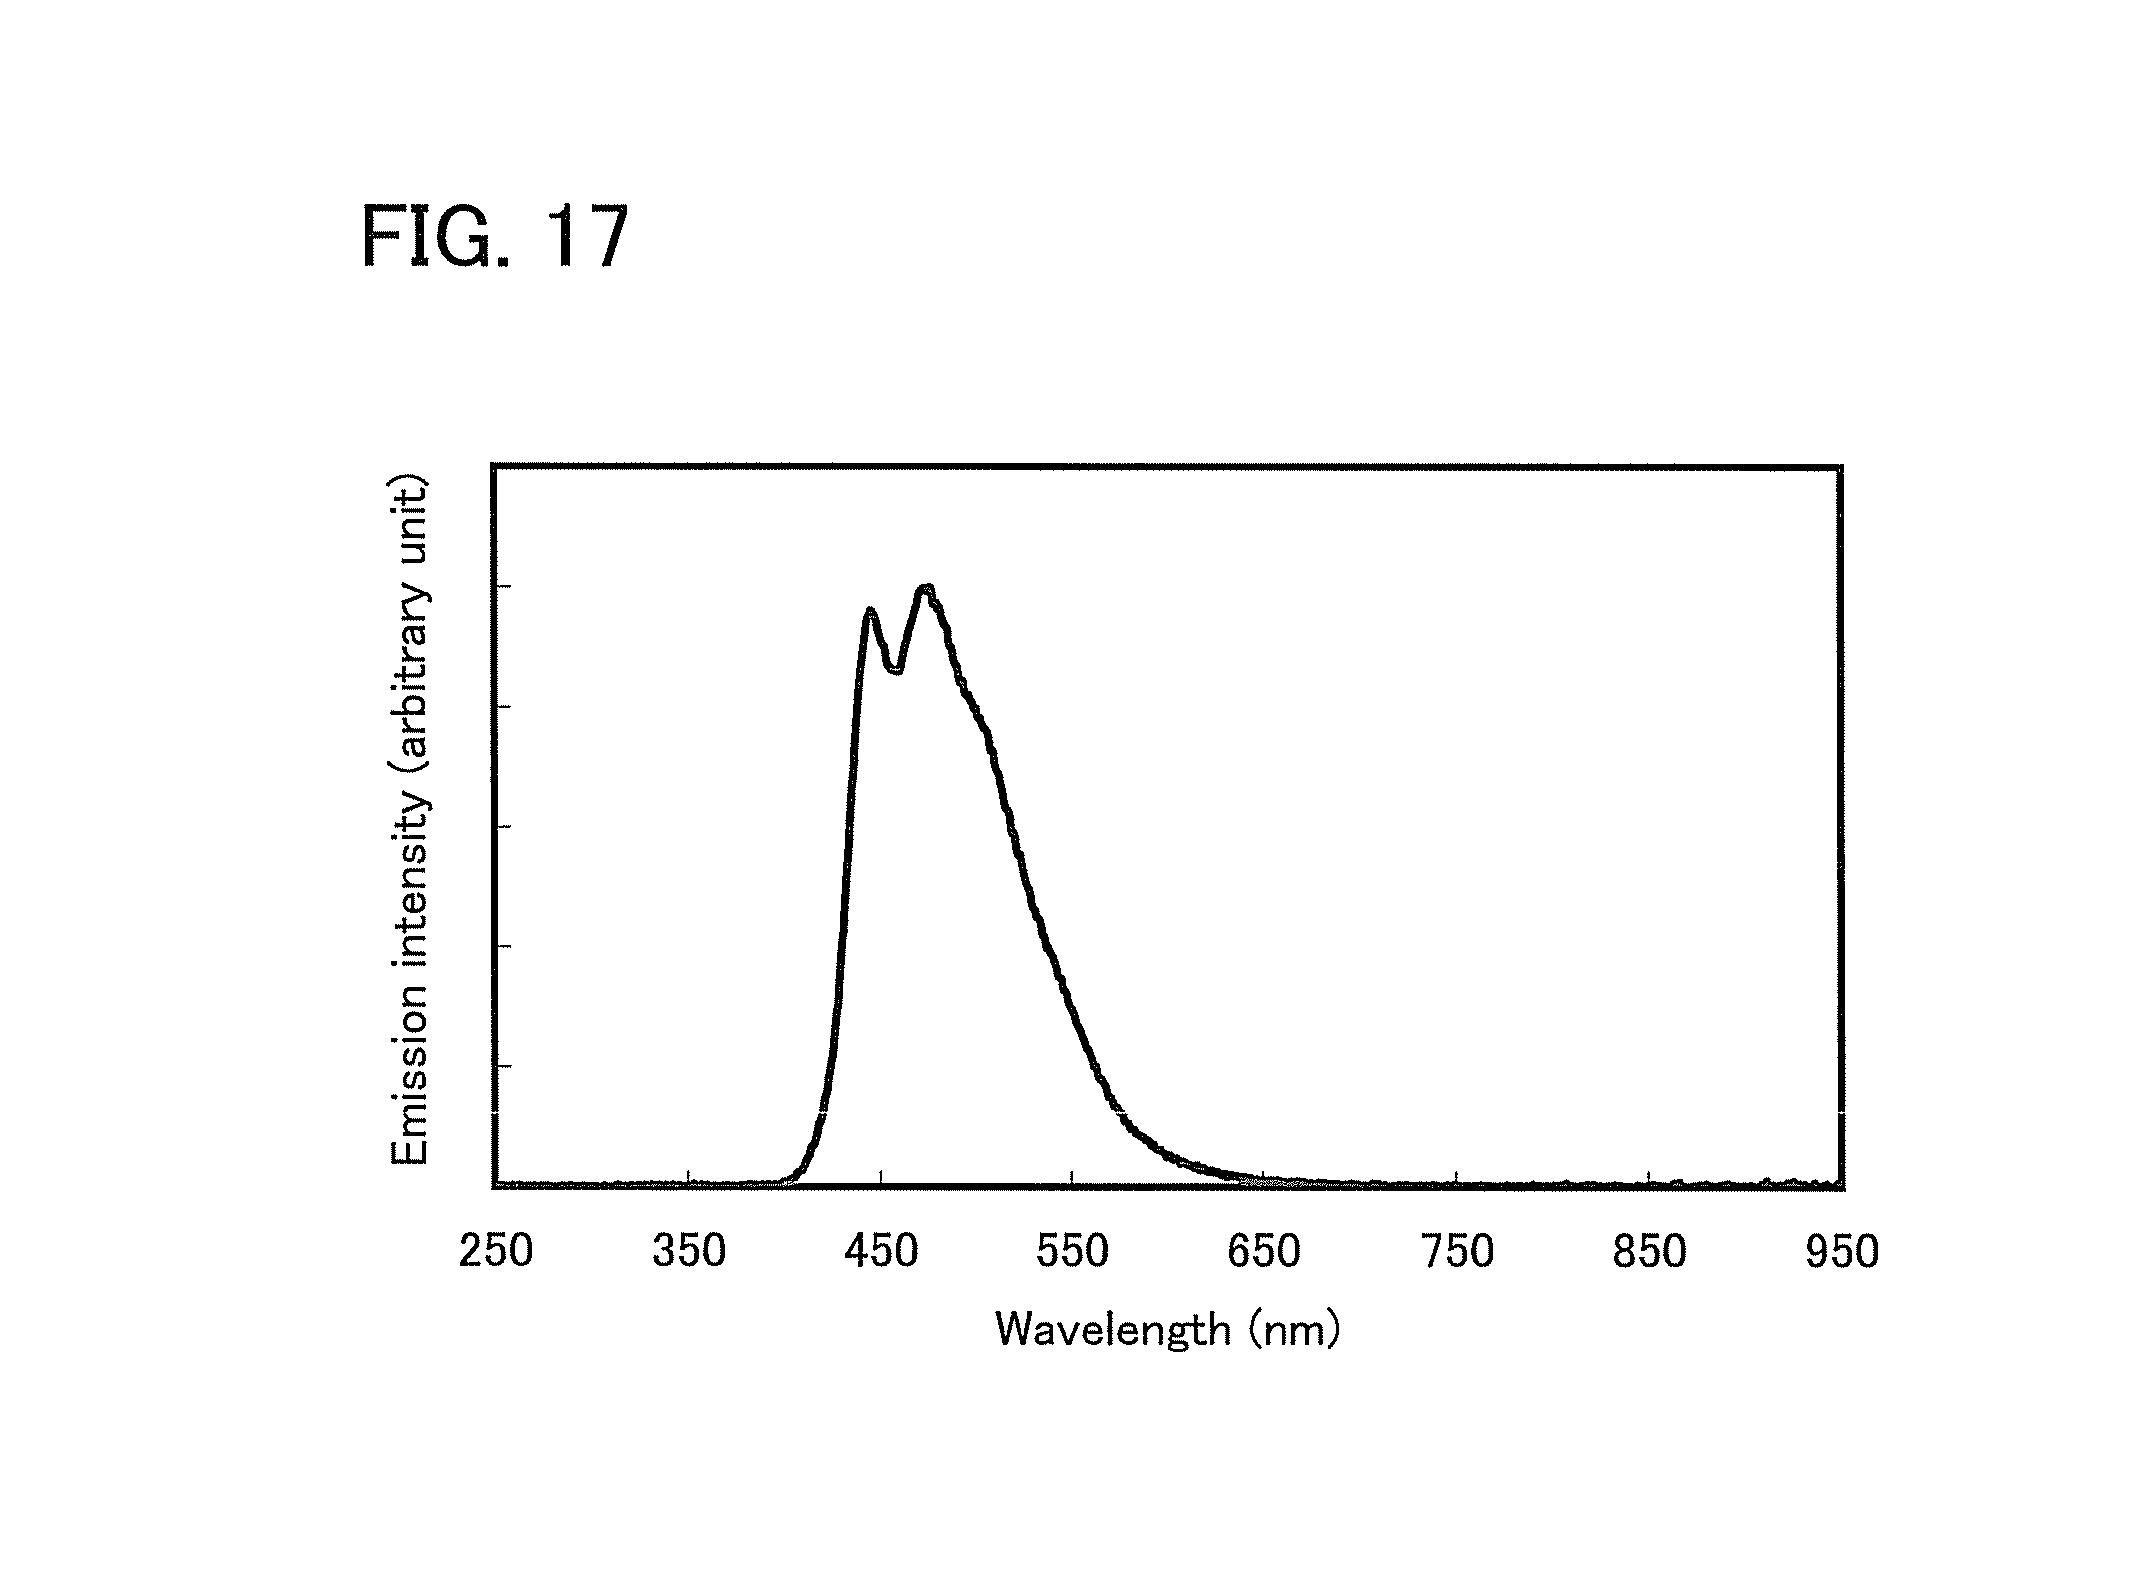 US9079855B2 - Carbazole compound, light-emitting element